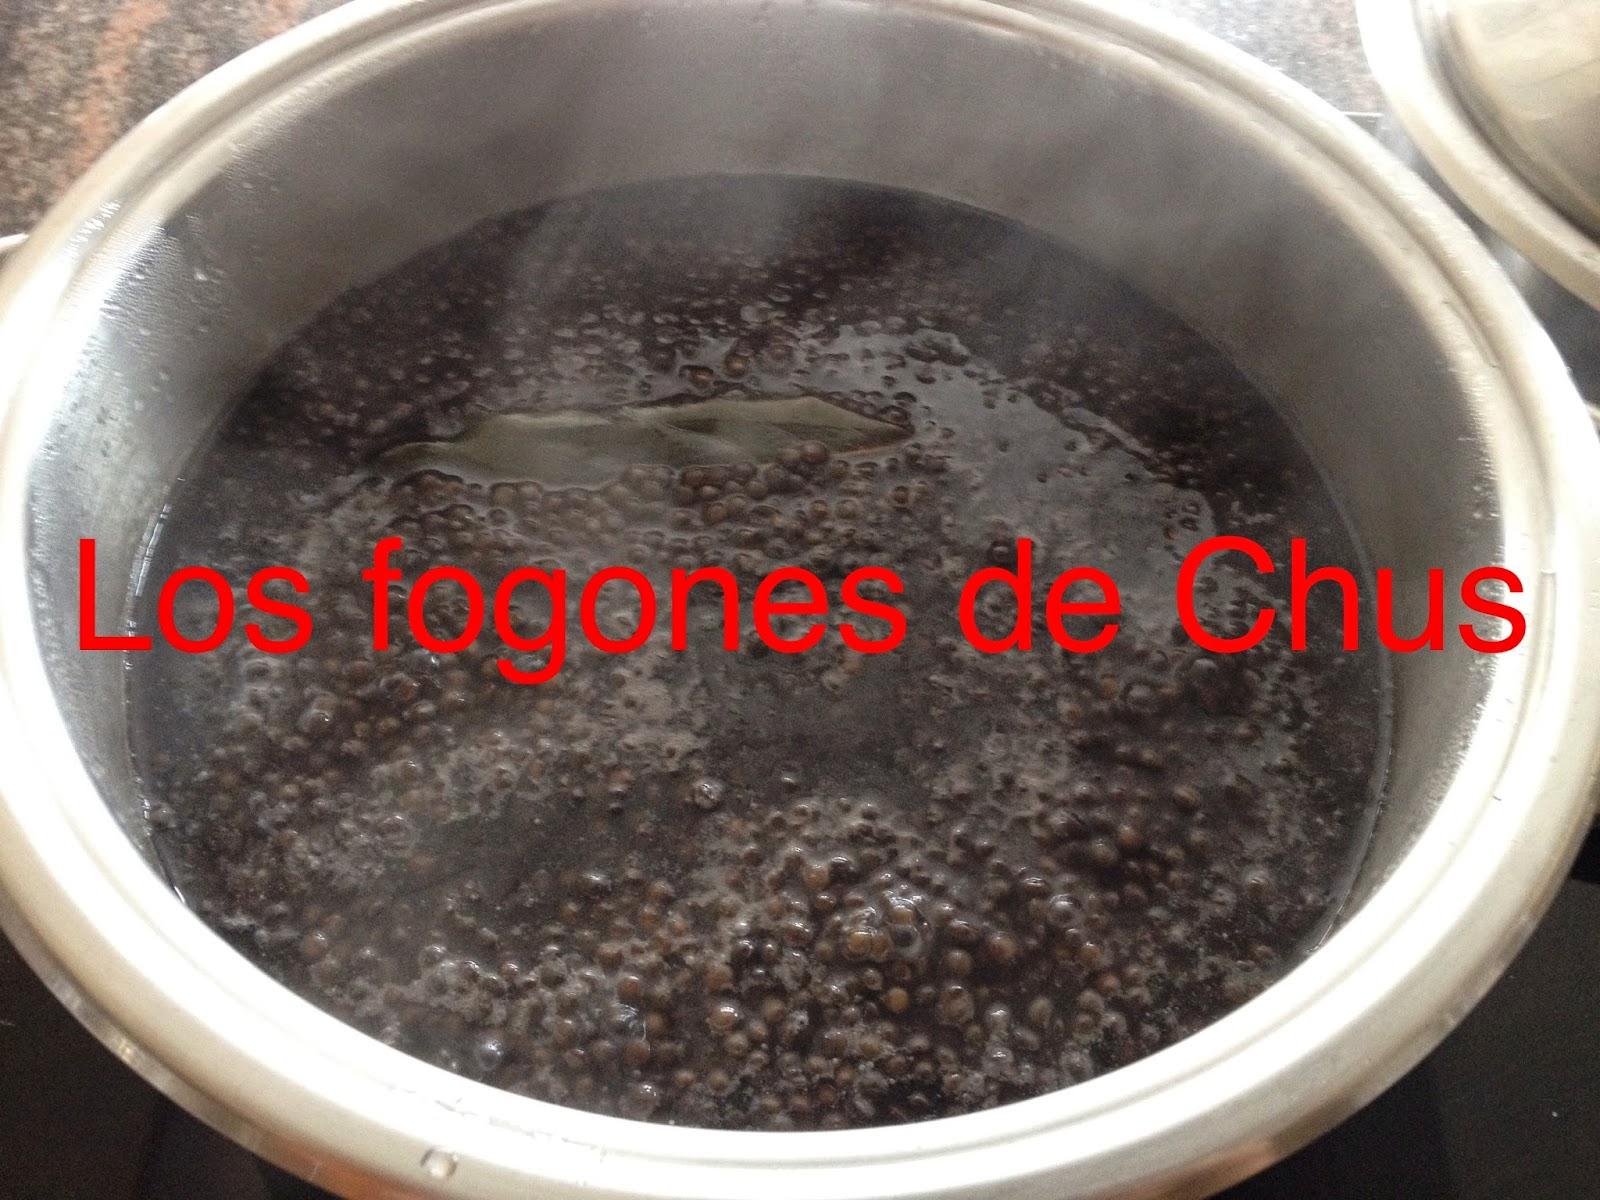 Los fogones de chus lentejas caviar - Limpiar calamares pequenos ...